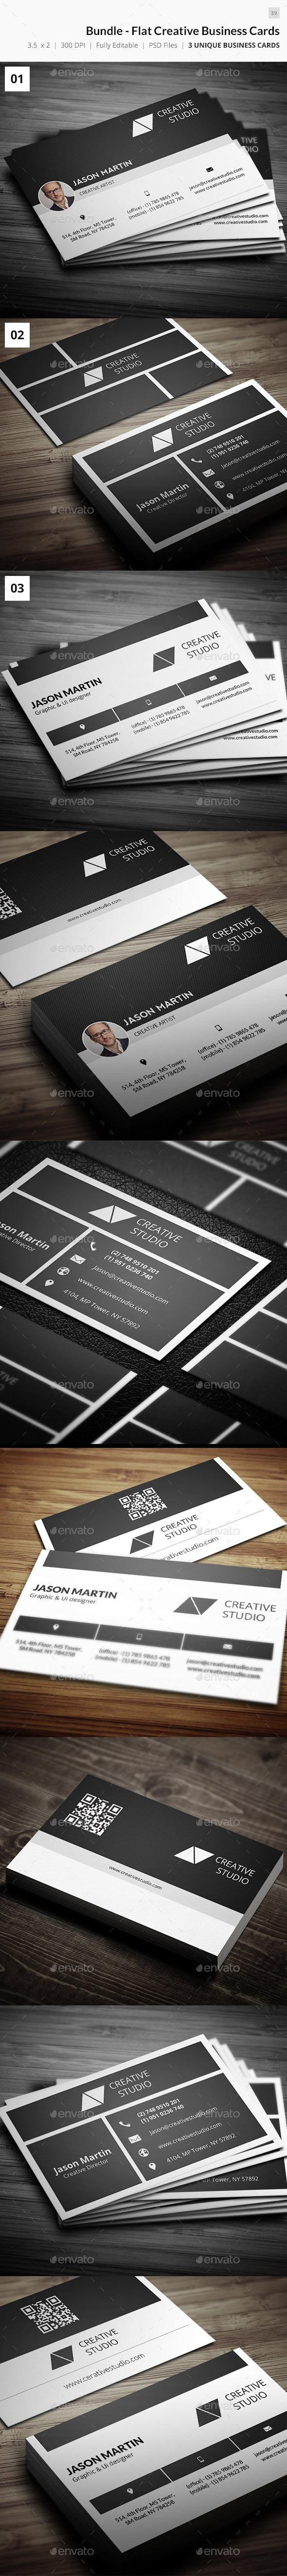 Bundle - Creative Flat Business Cards - 39 #template #creative #business